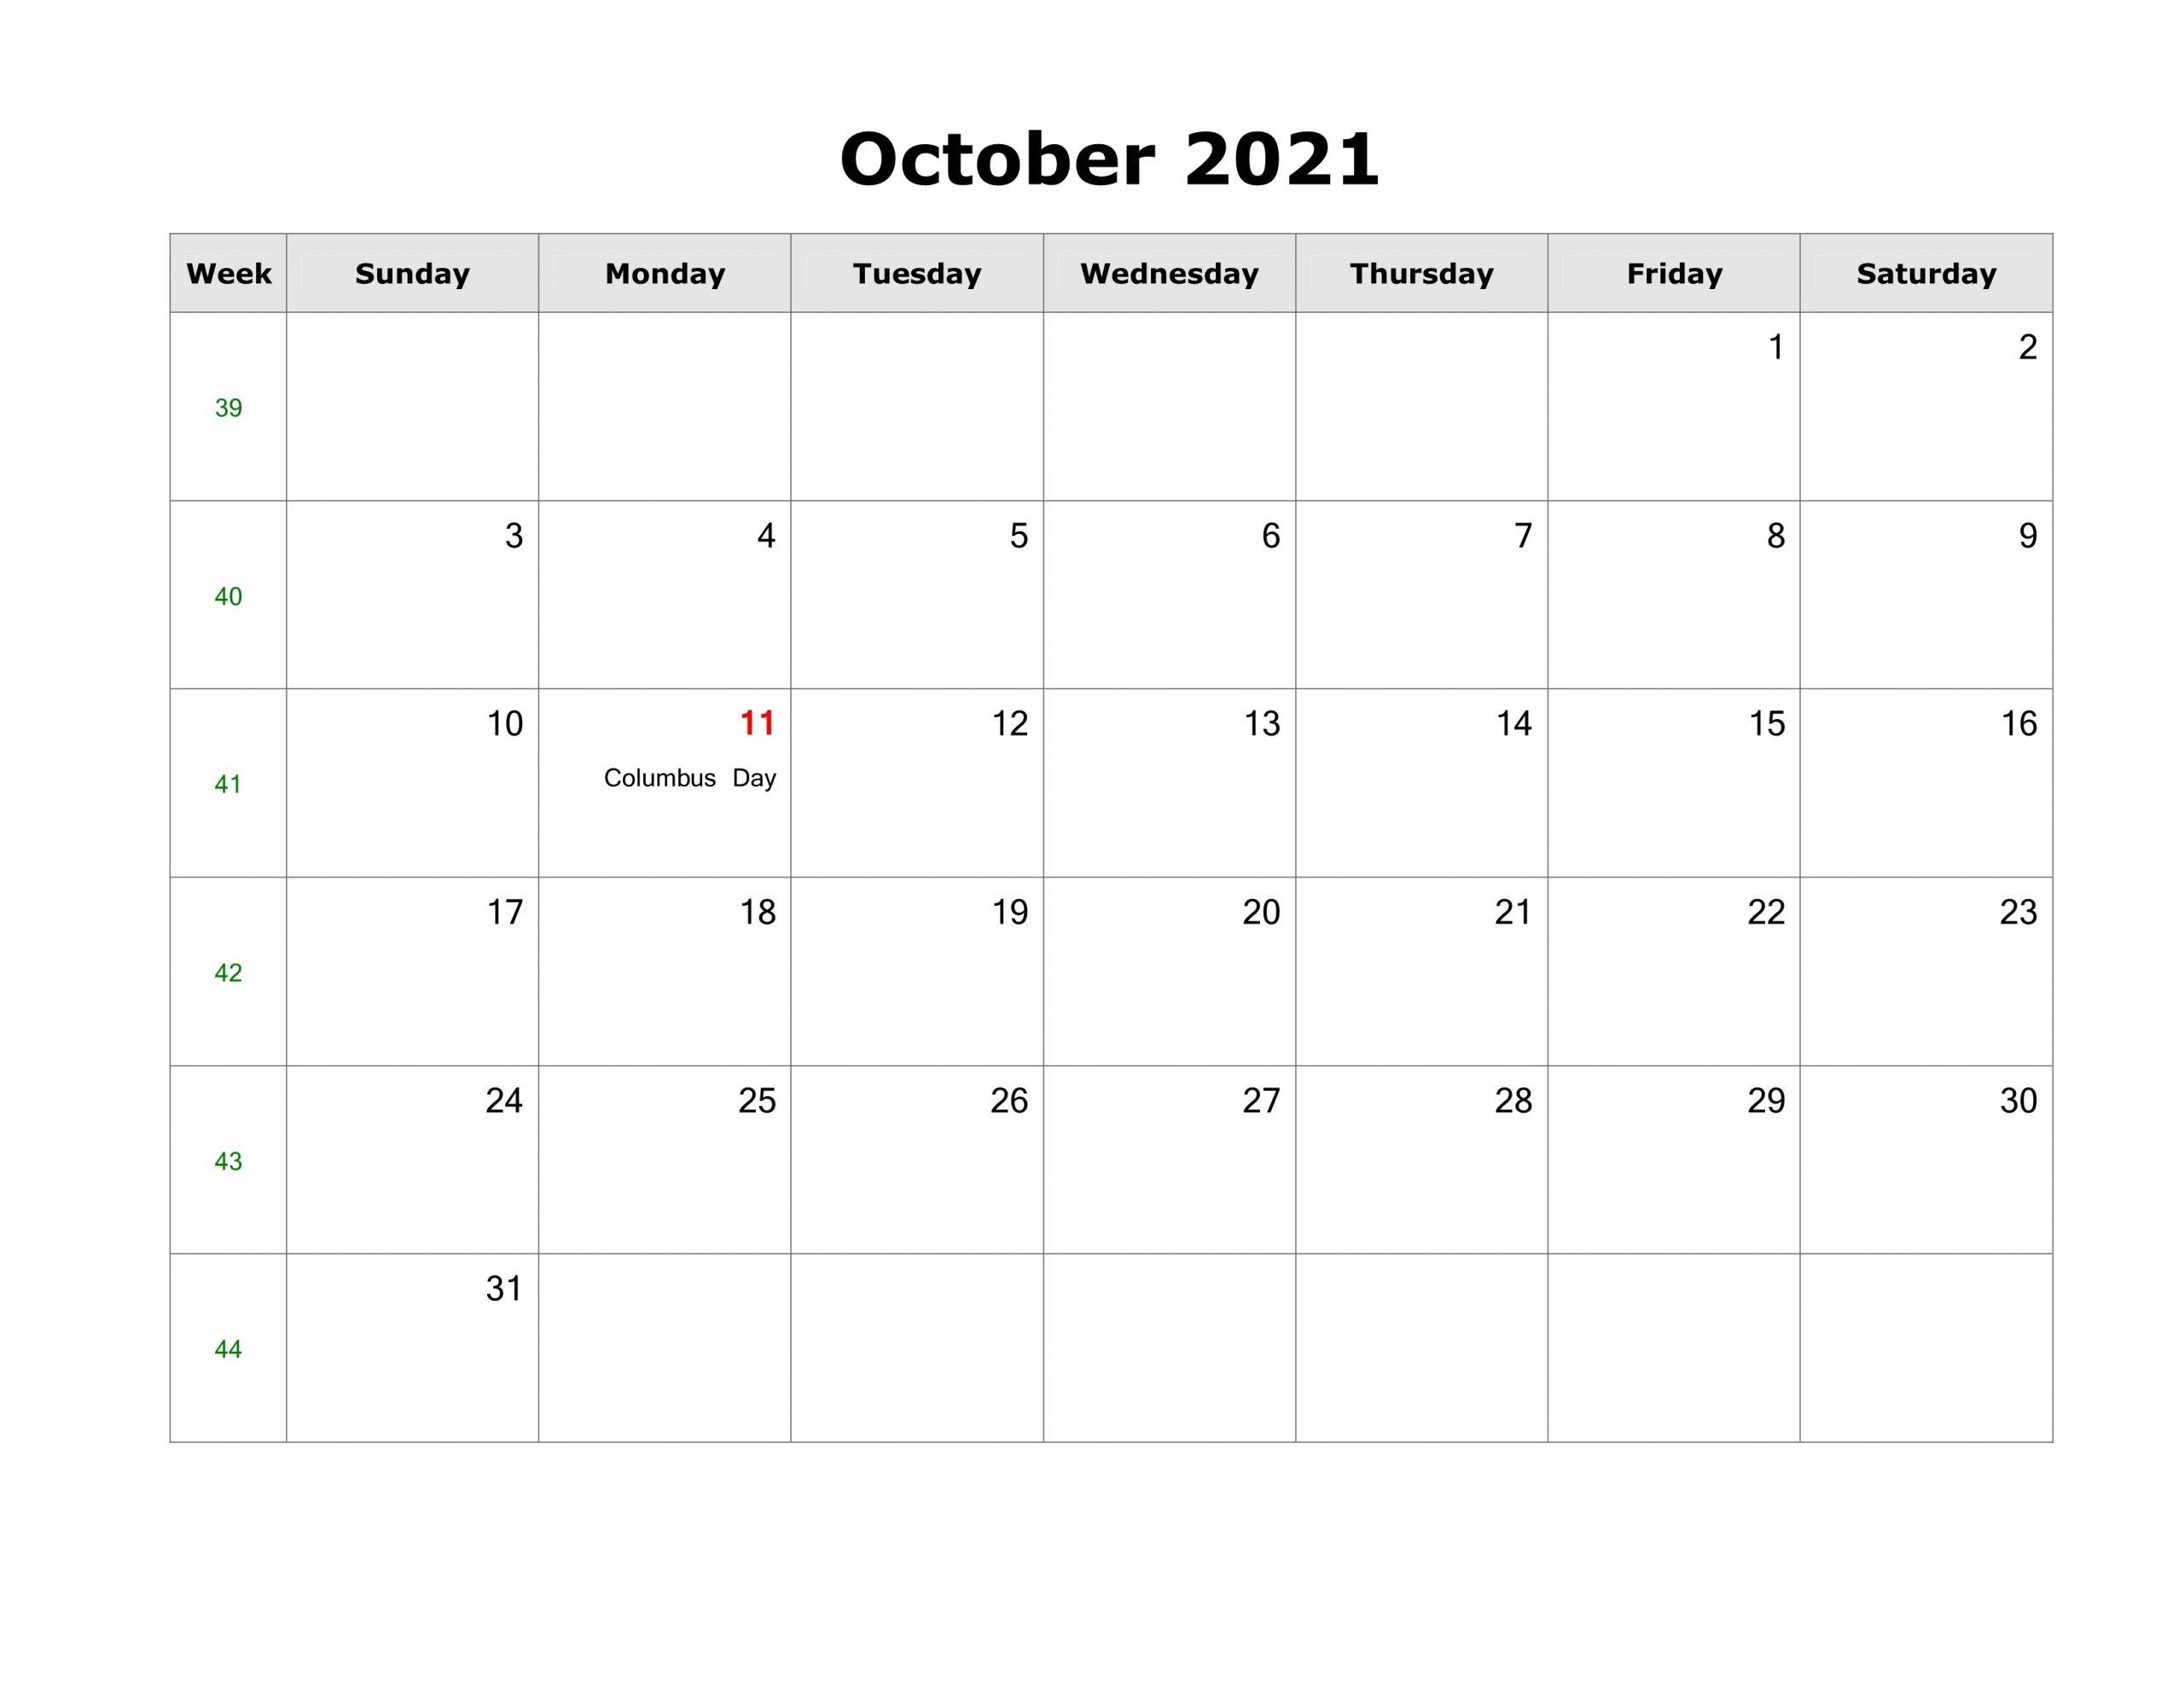 October 2021 Printable Calendar Specific Dates